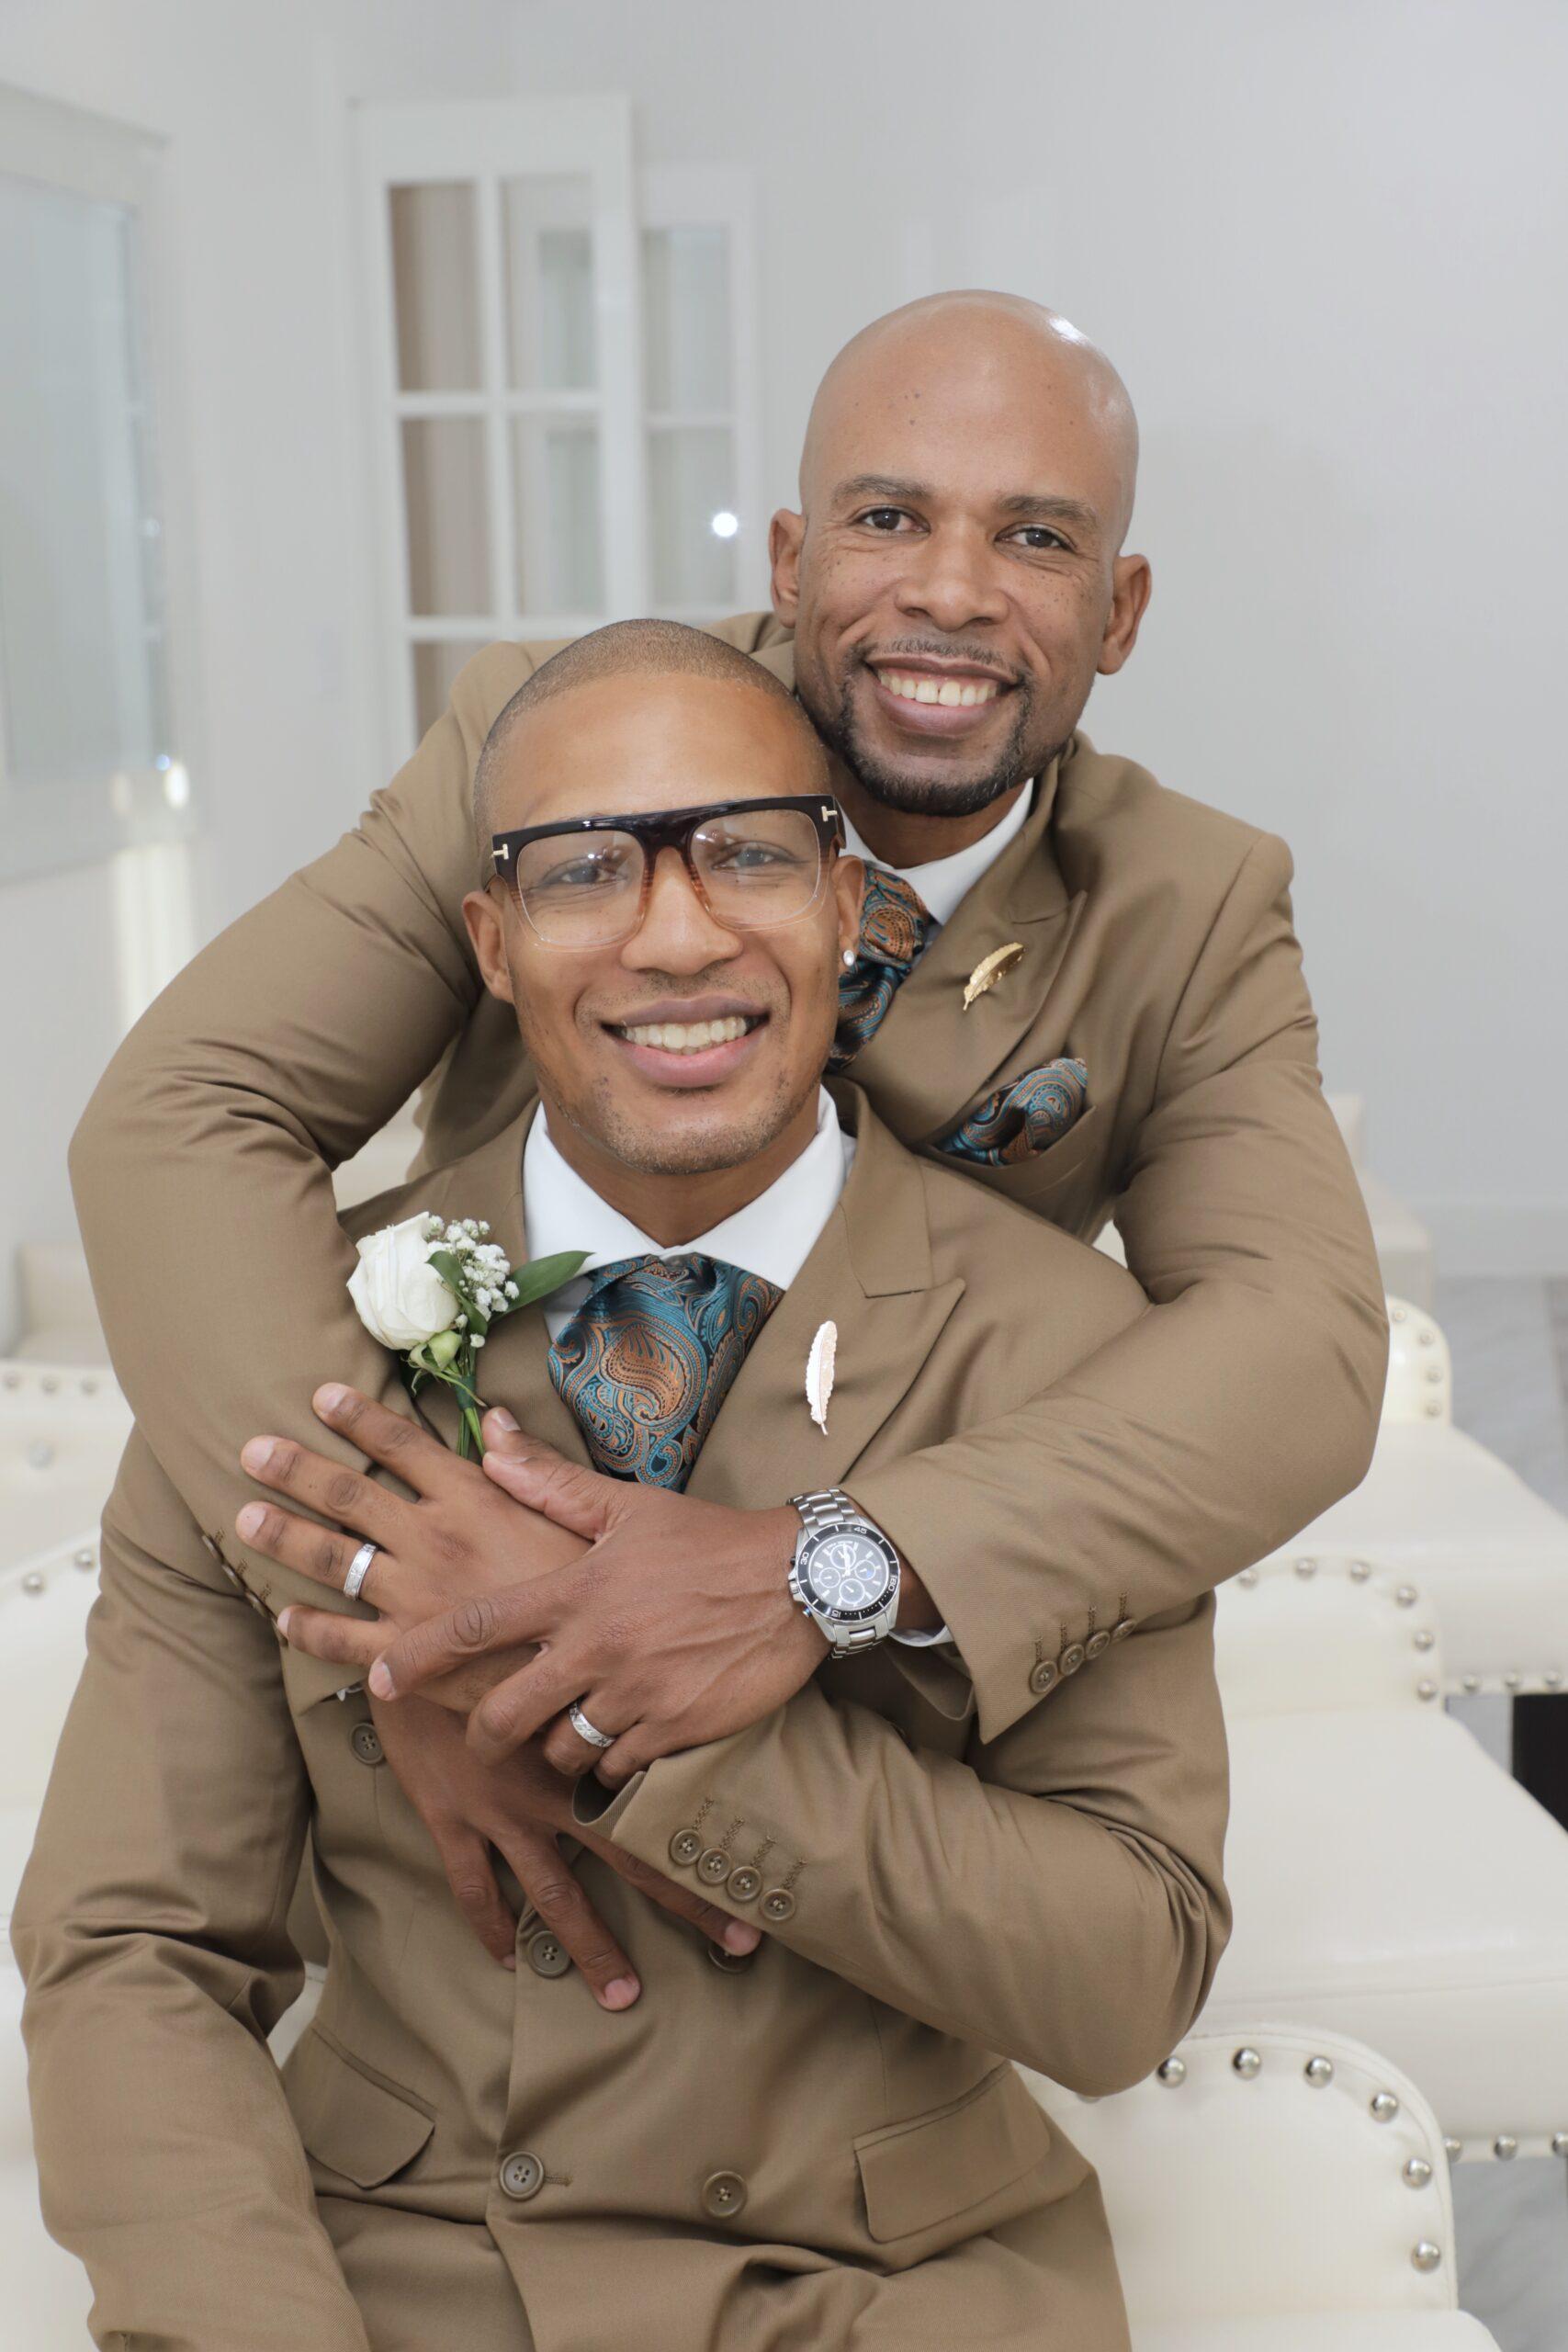 las vegas wedding chapels packages